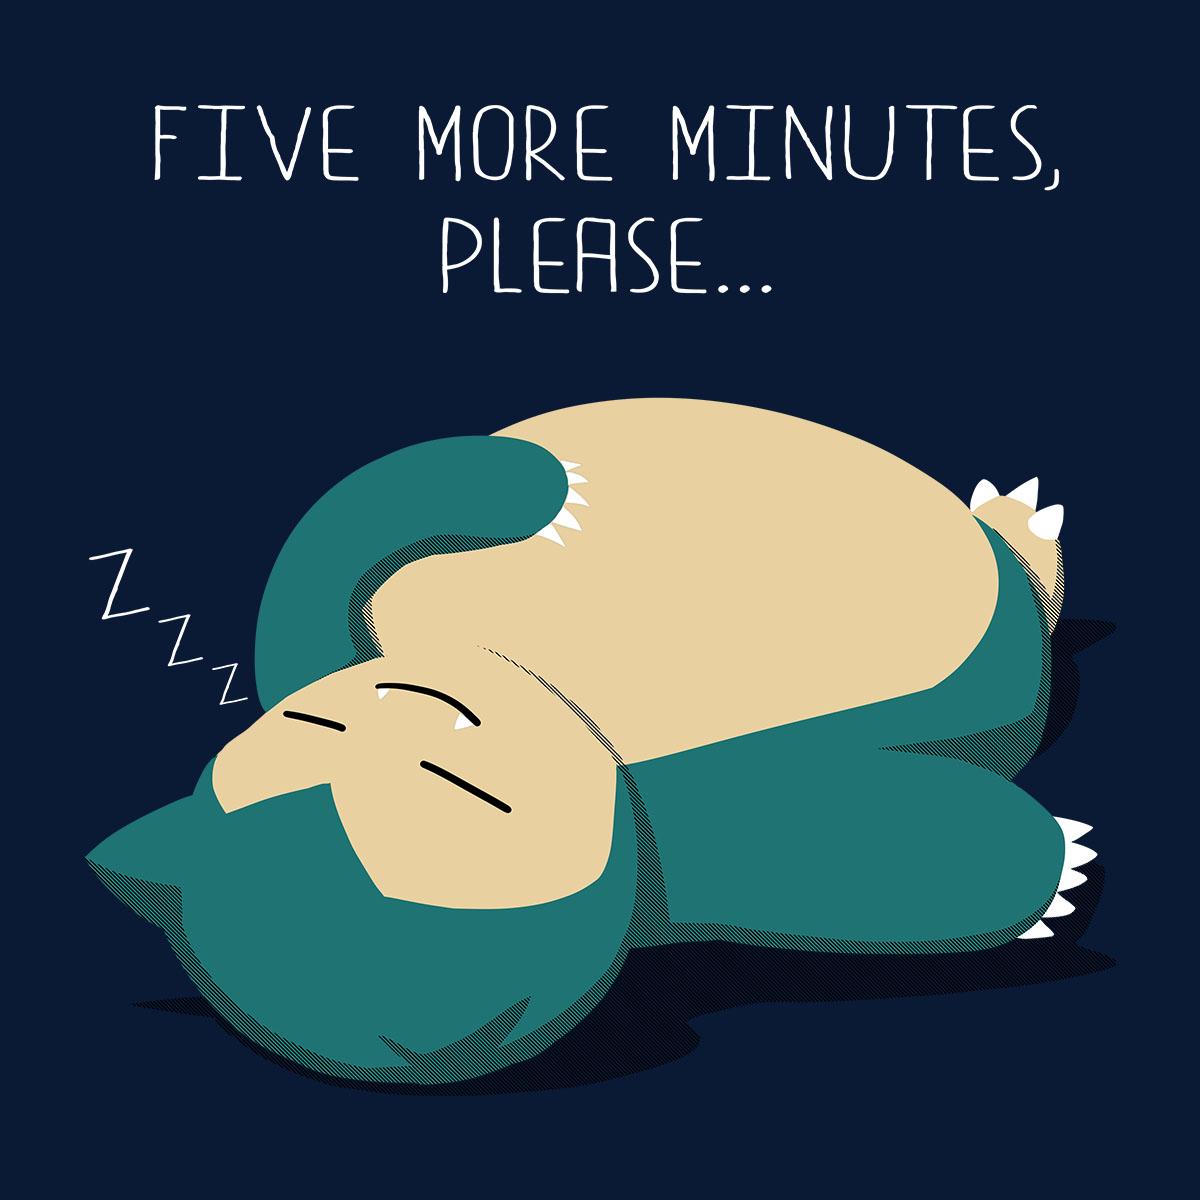 Pokemon-Snorlax-Five-More-Minutes-Please-Men-039-s-T-Shirt thumbnail 2